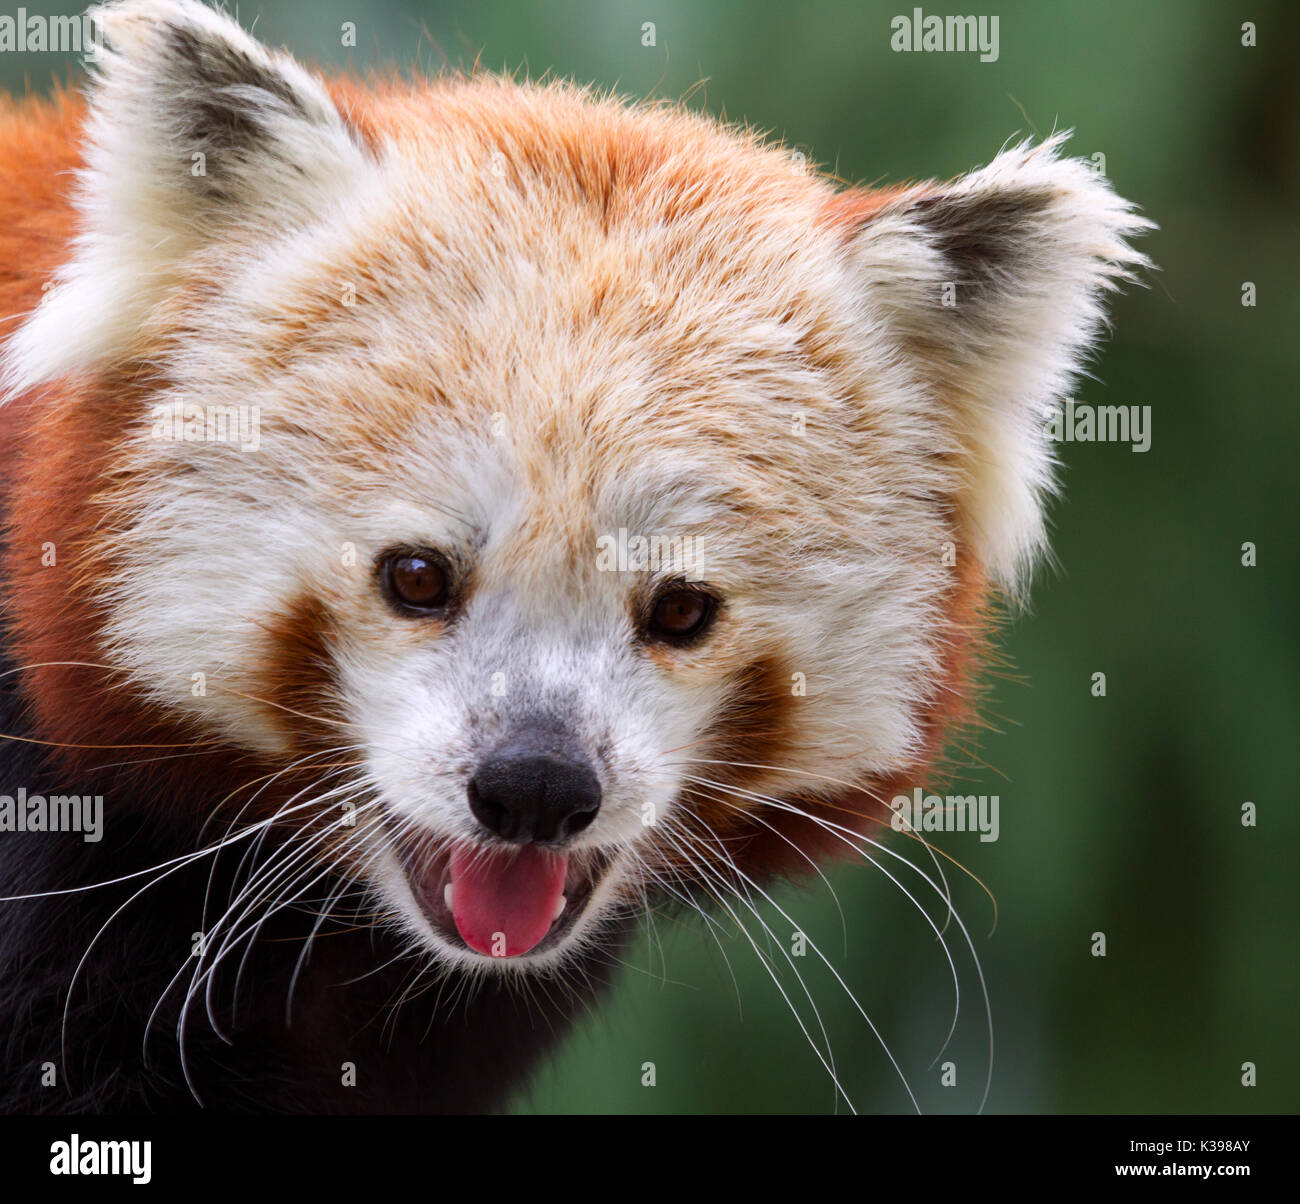 Red panda (Ailurus fulgens) at Blank Zoo Des Moines, IA, USA - Stock Image